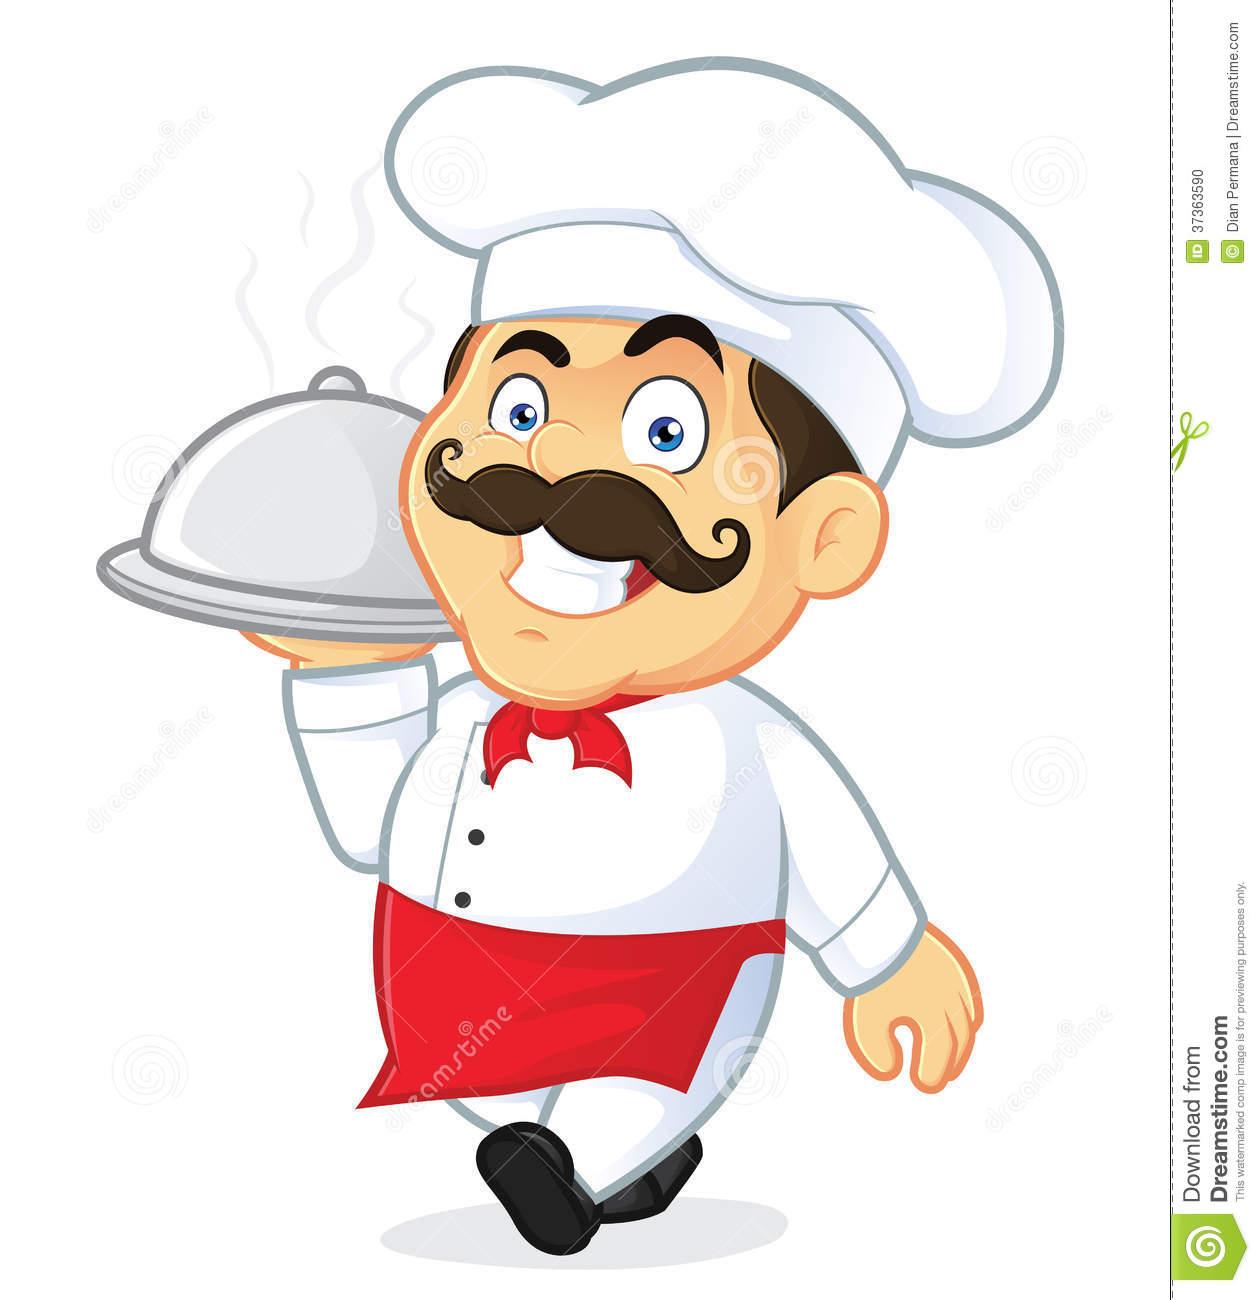 Clipart Picture Of A Chef .-Clipart Picture Of A Chef .-11